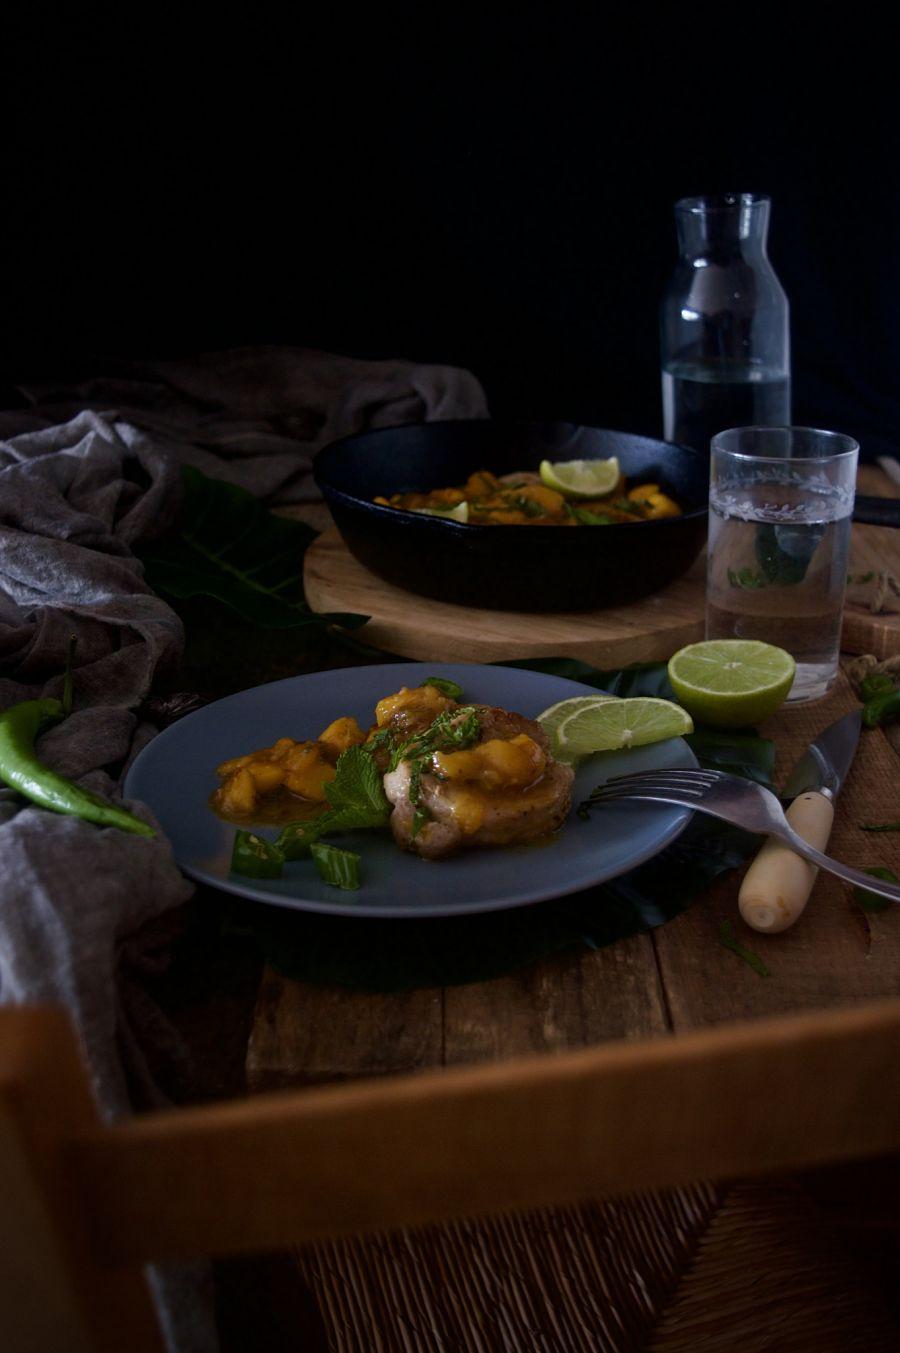 solomillo-de-cerdo-glaseado-con-salsa-de-mango